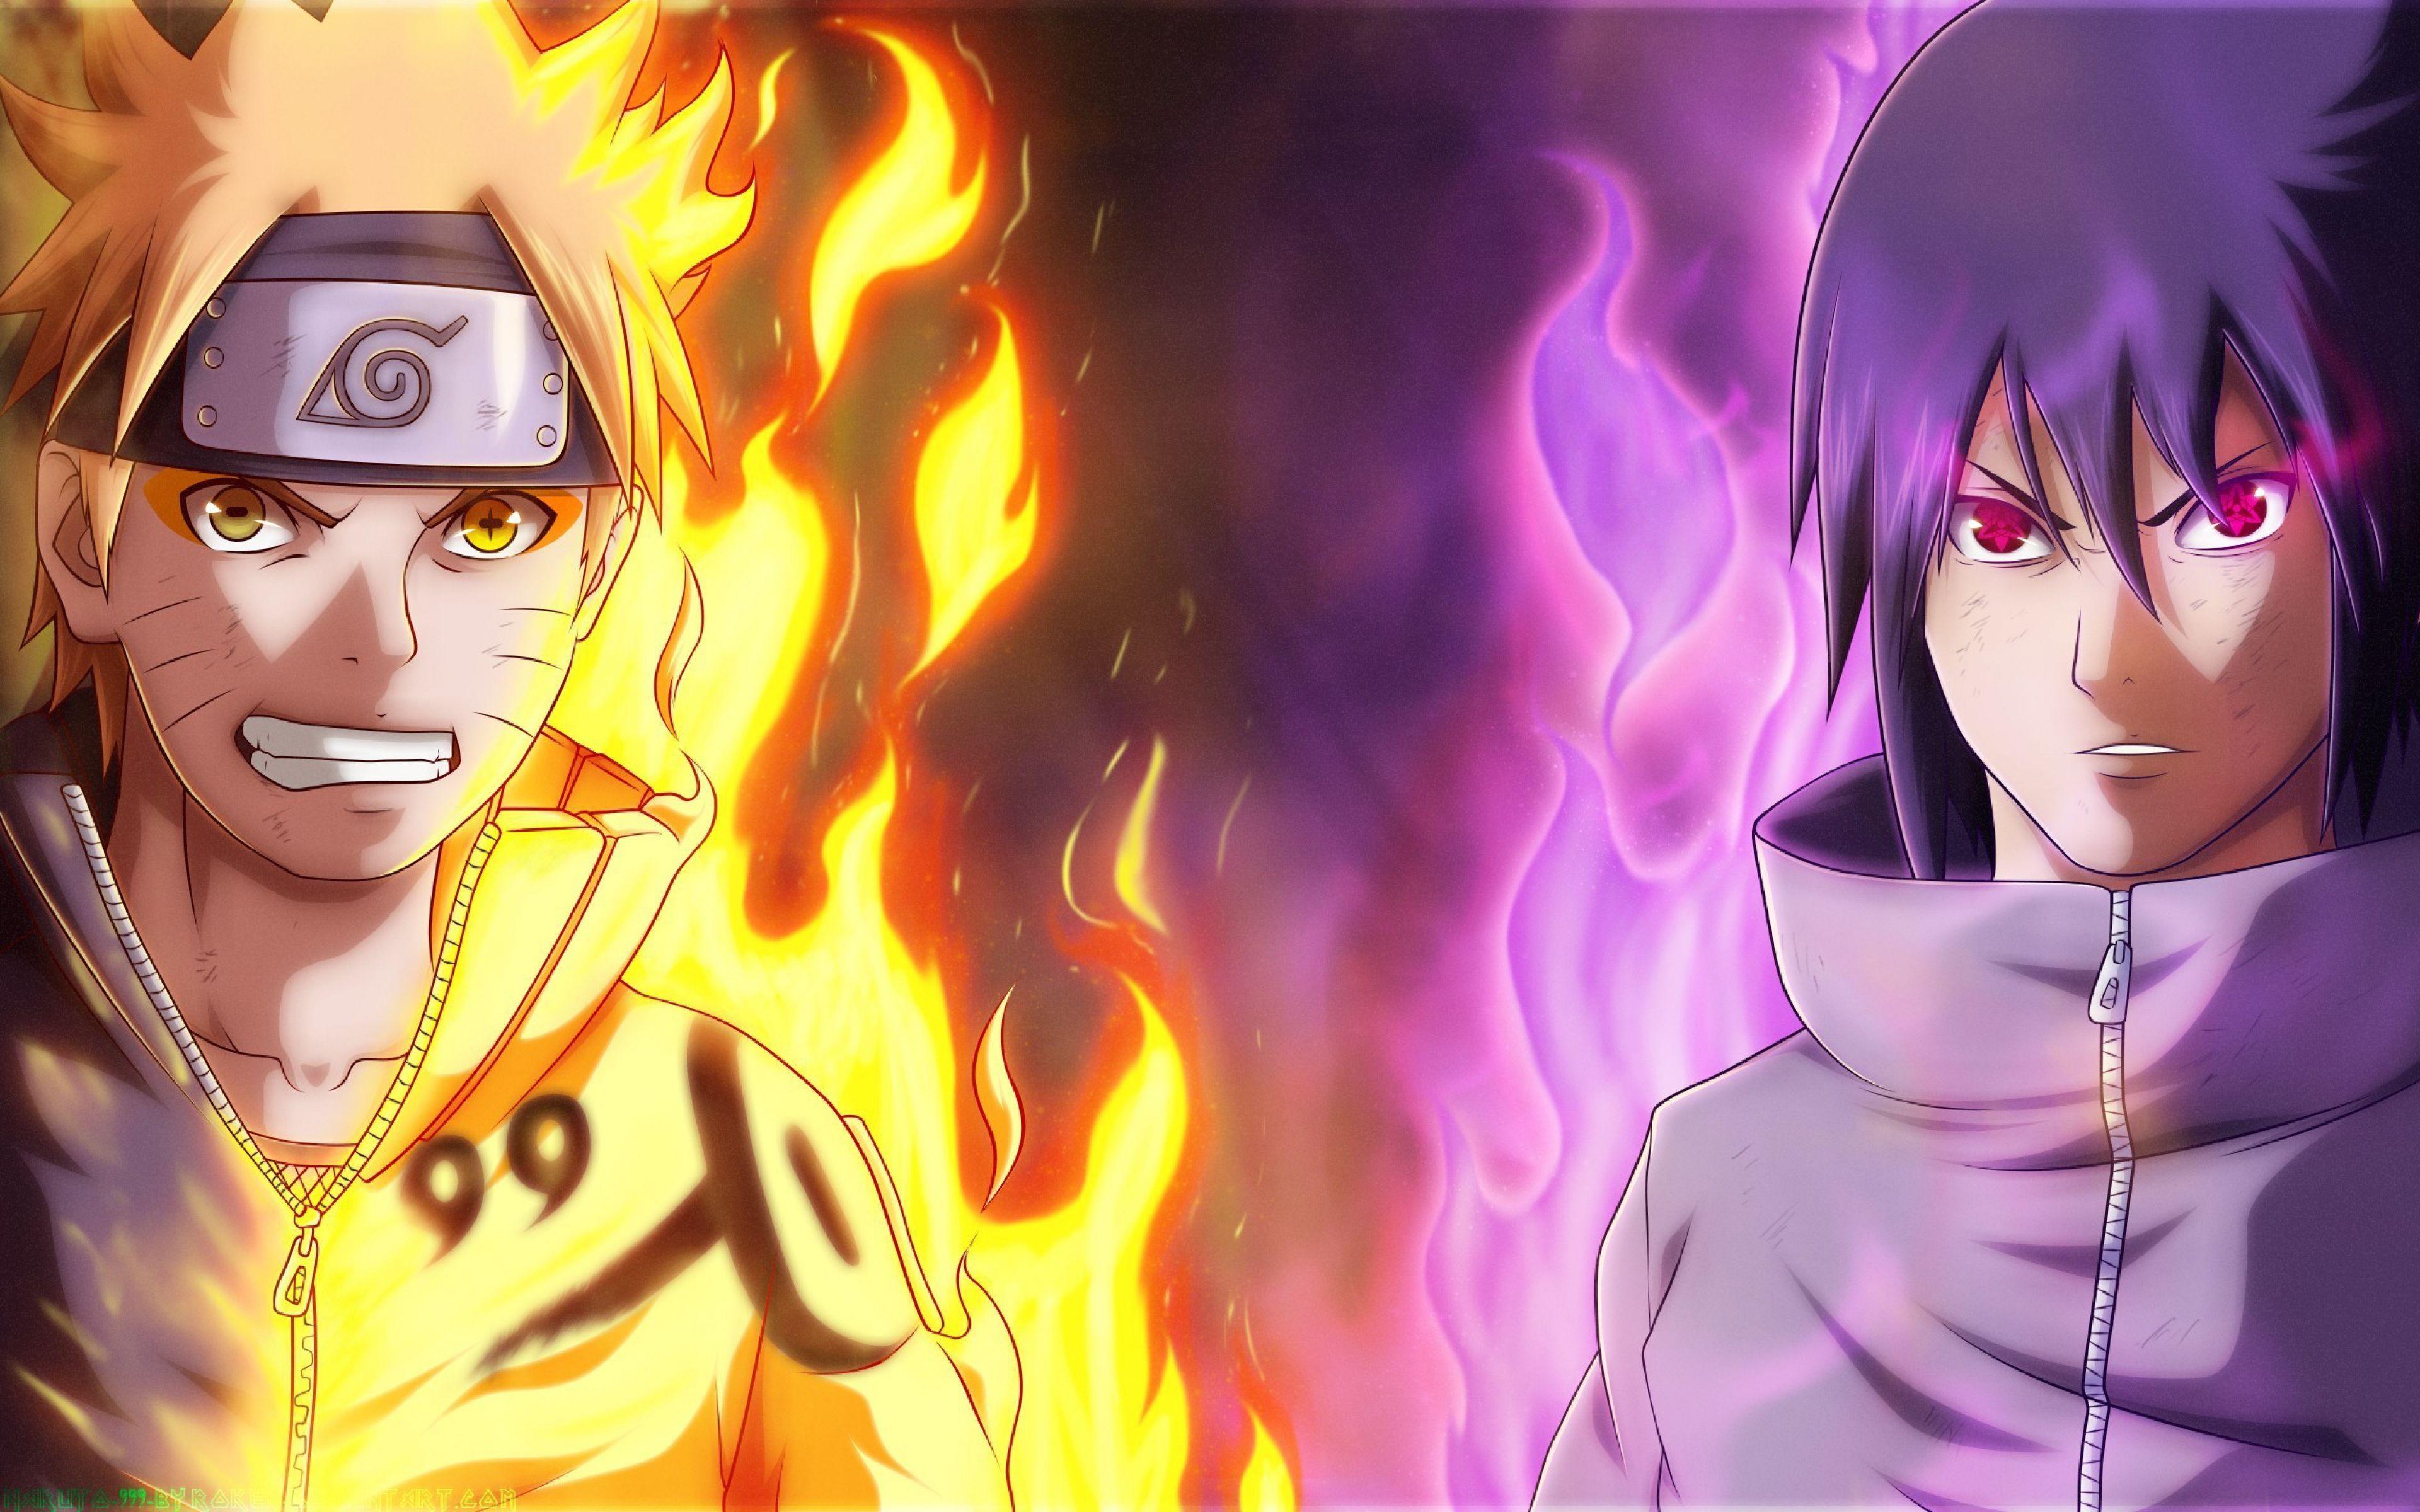 4k Sasuke Wallpapers Top Free 4k Sasuke Backgrounds